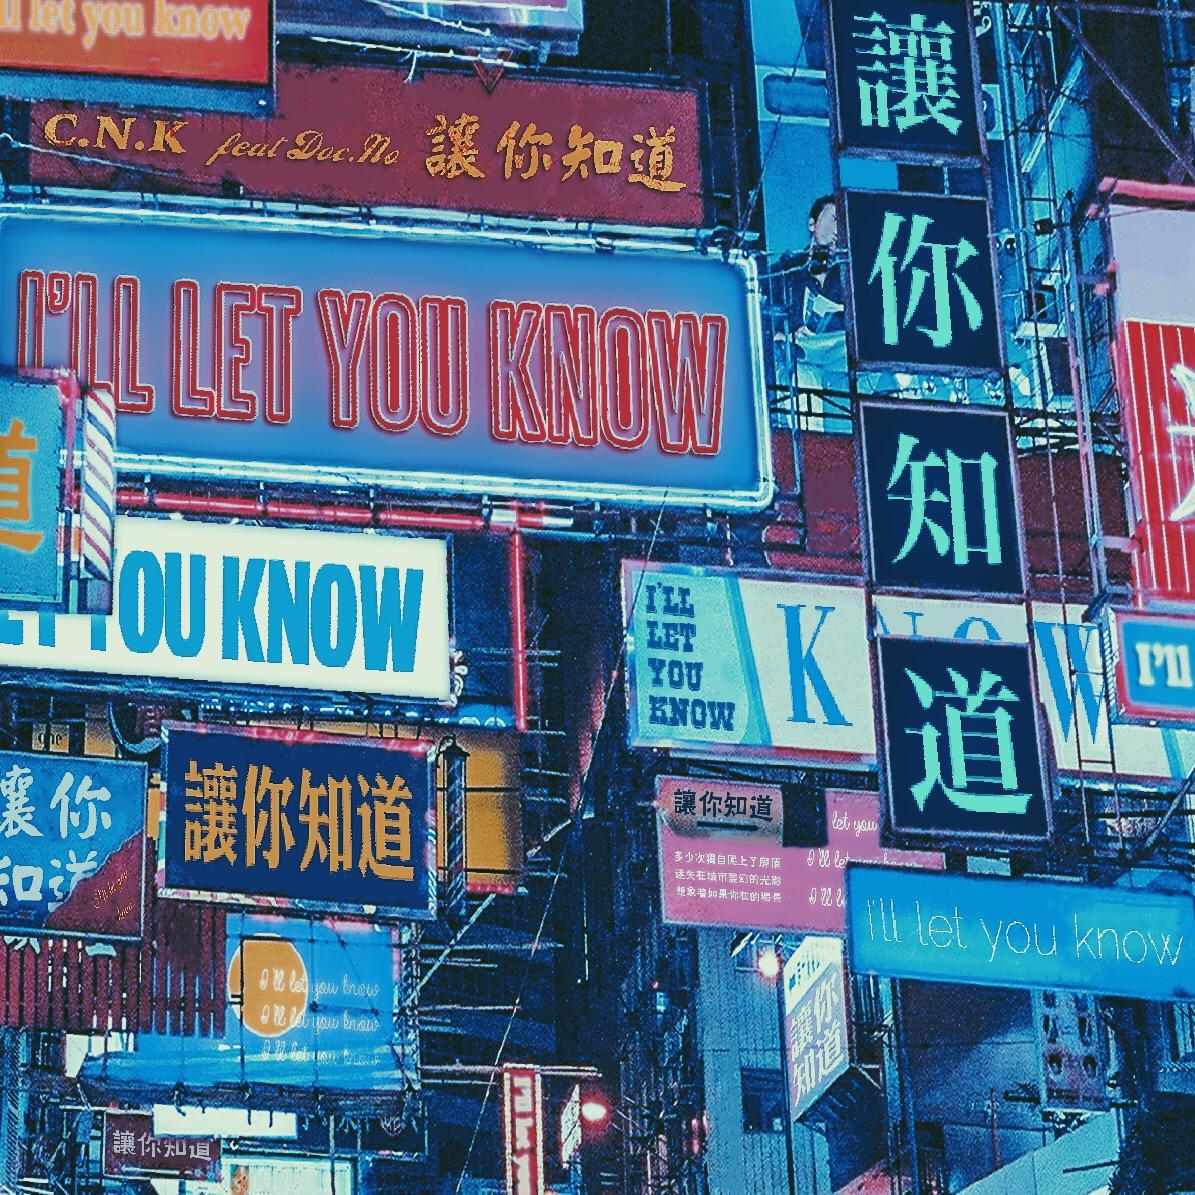 u+know+i'll+do